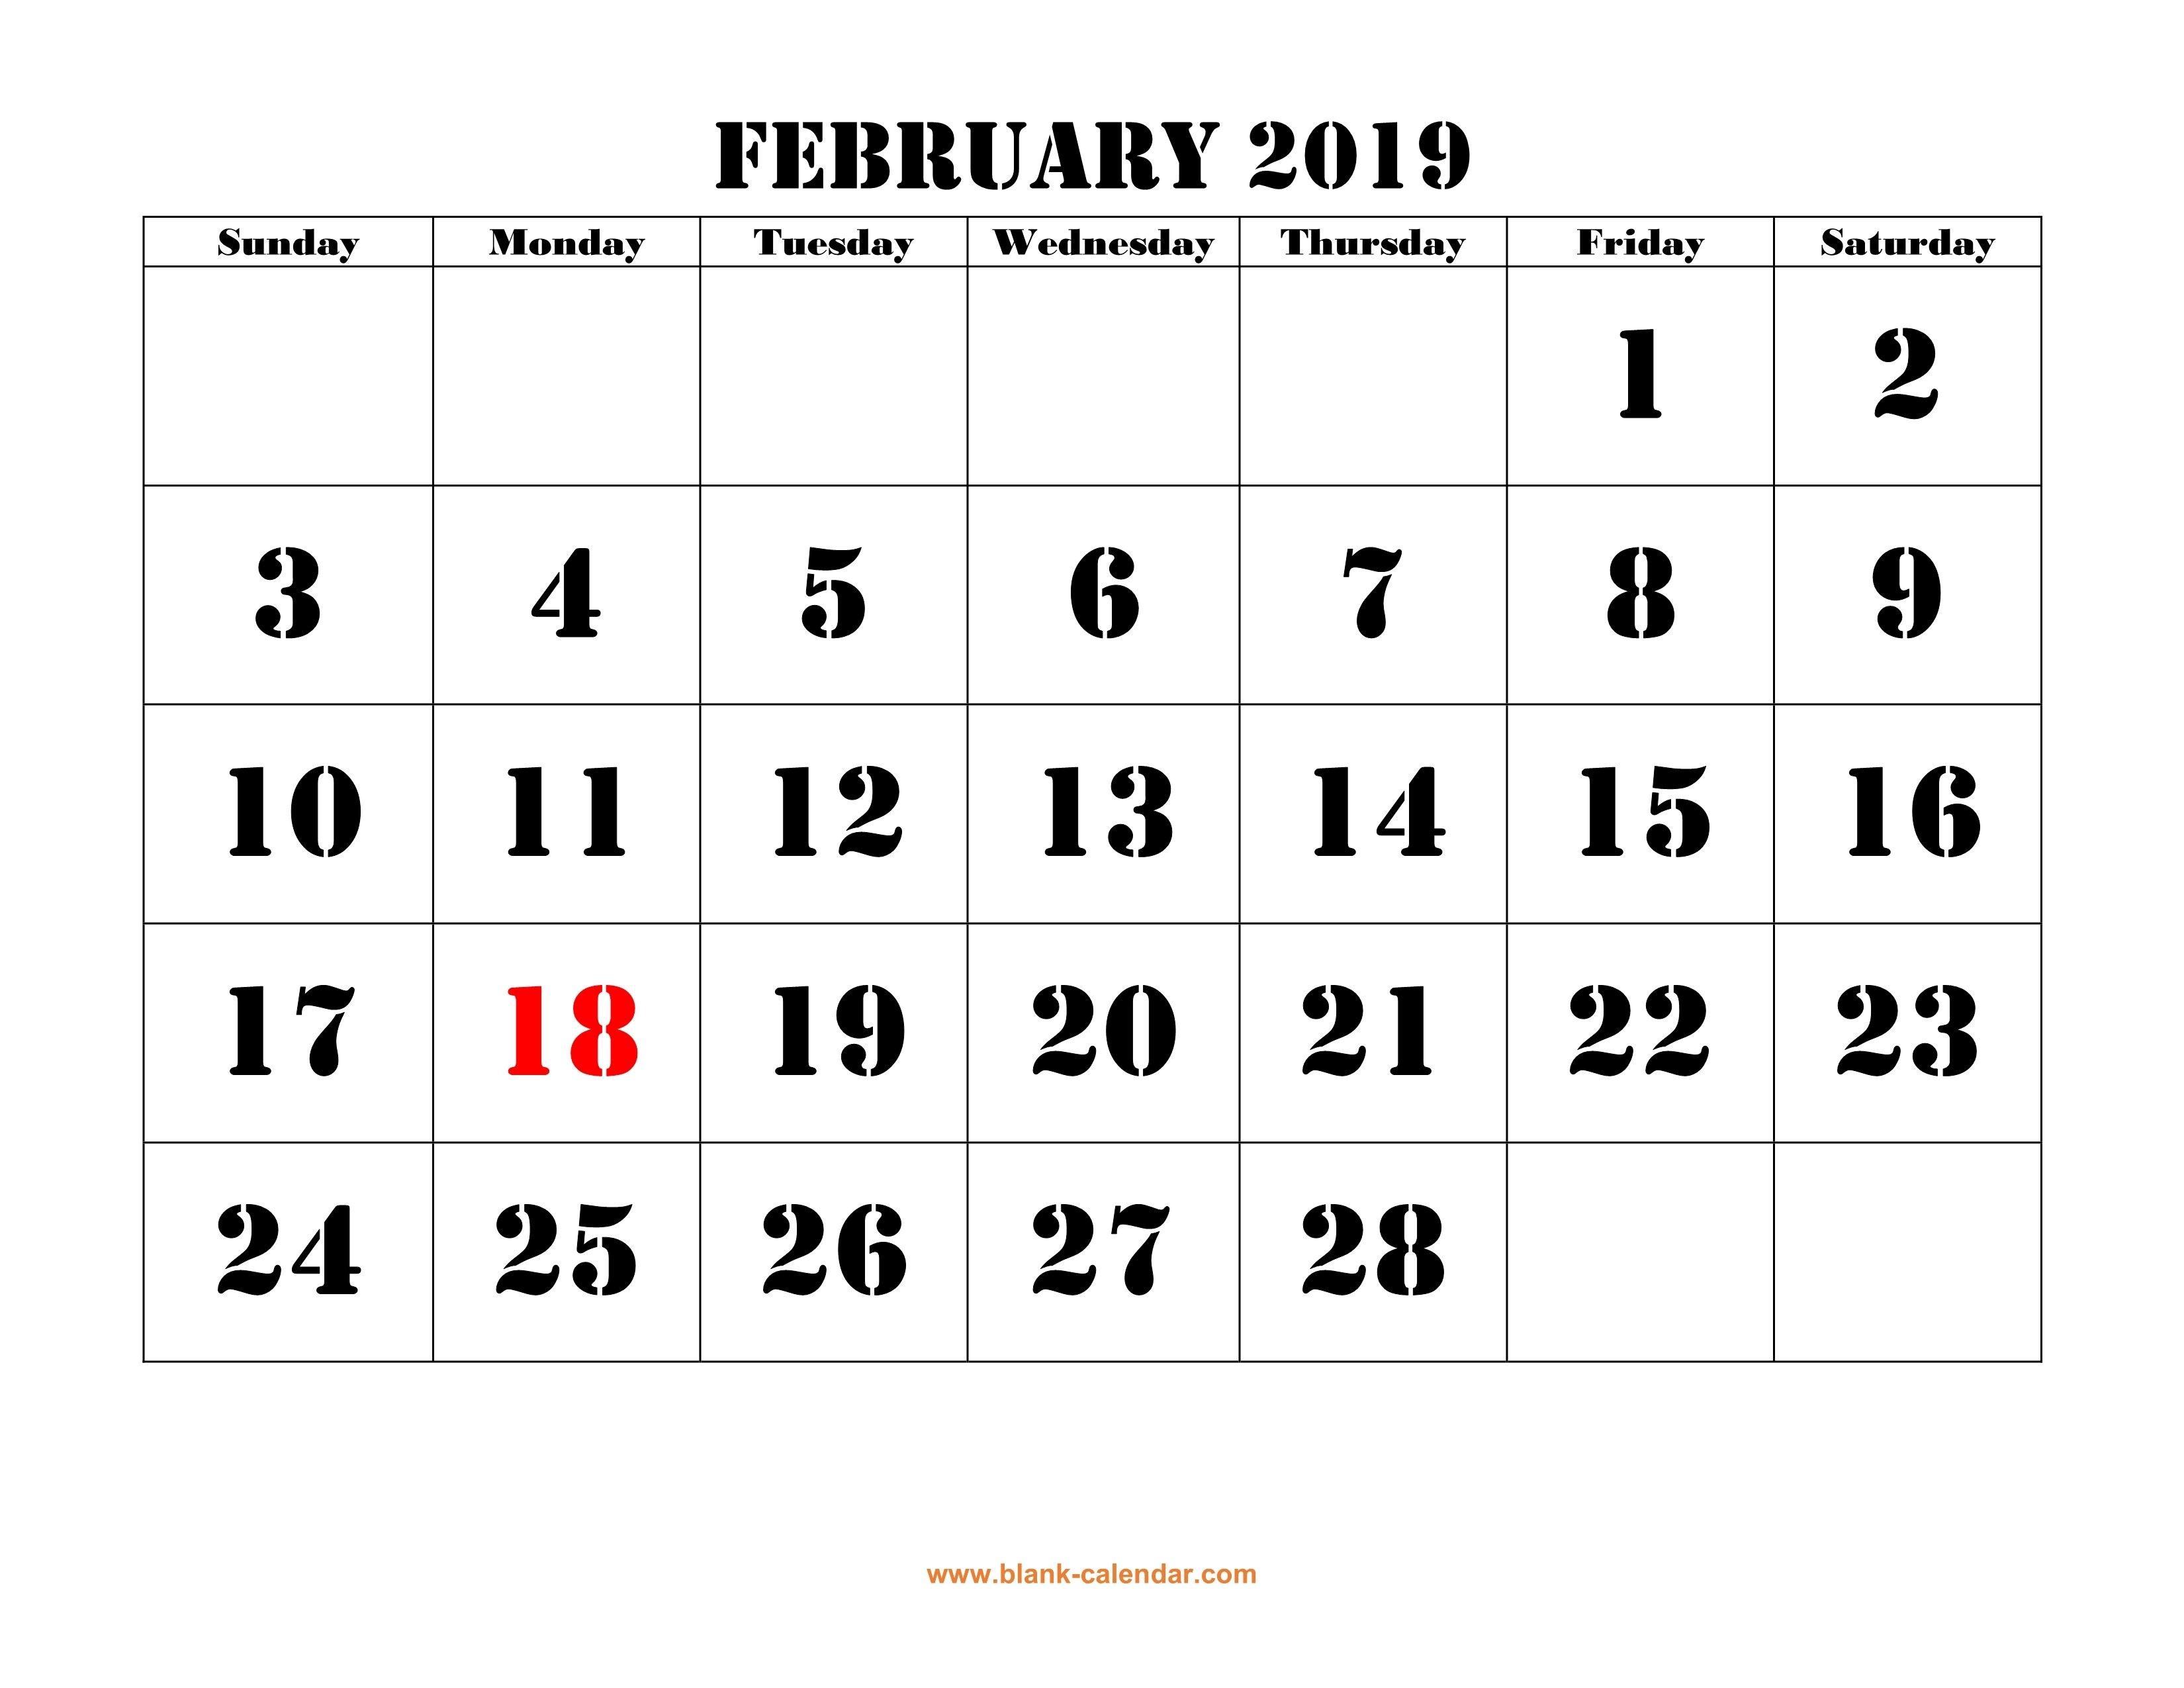 Free Download Printable February 2019 Calendar, Large Font Design Calendar Feb 8 2019